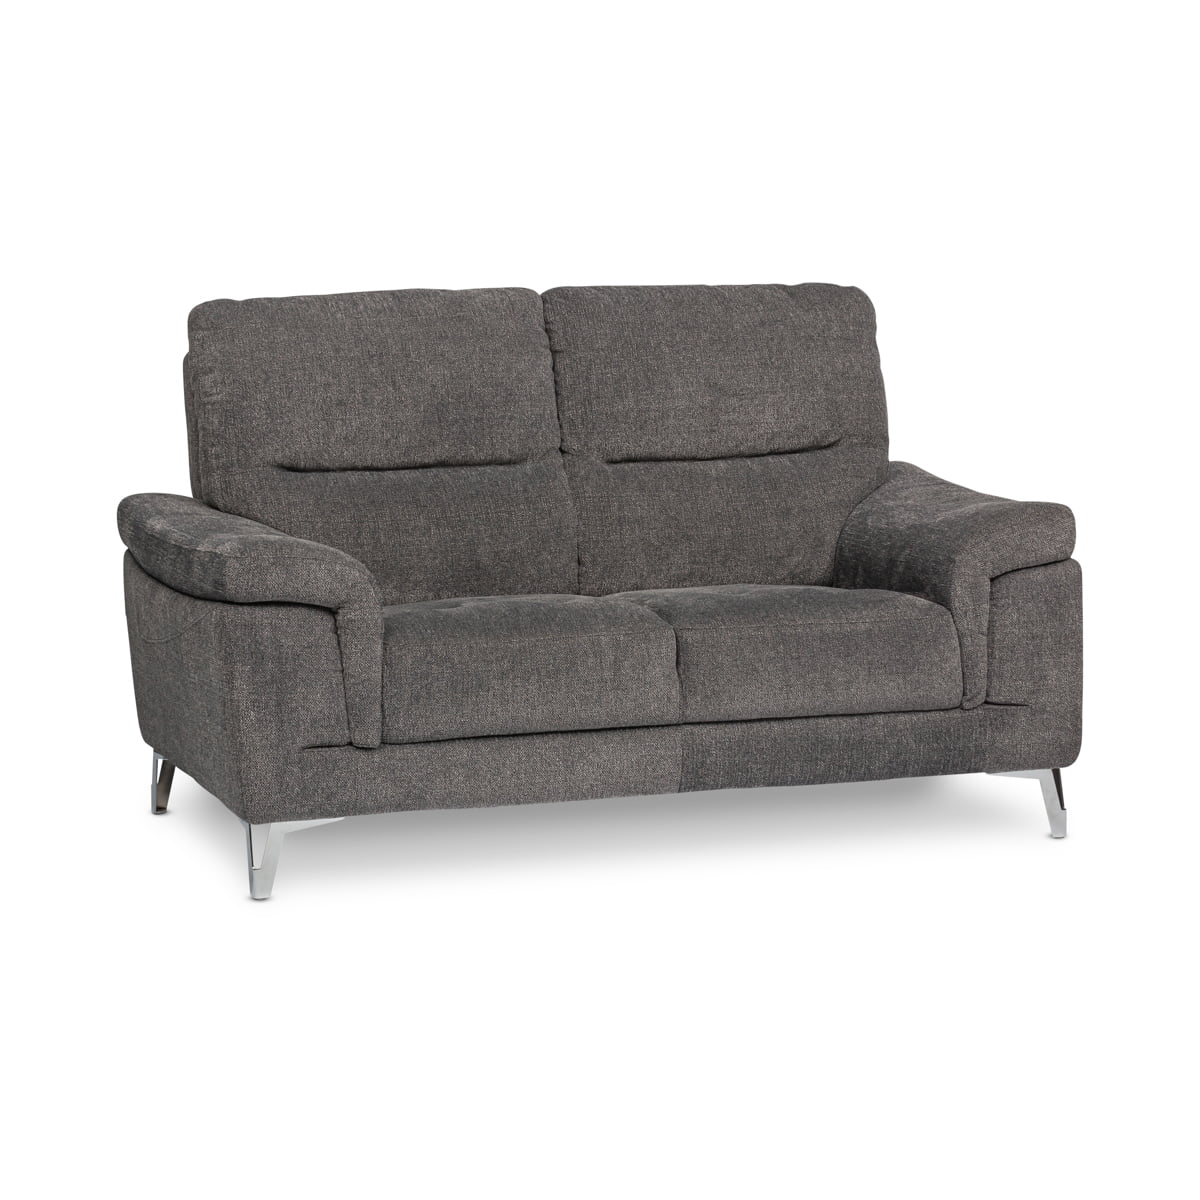 Henrietta Grey 2 Seater Sofa